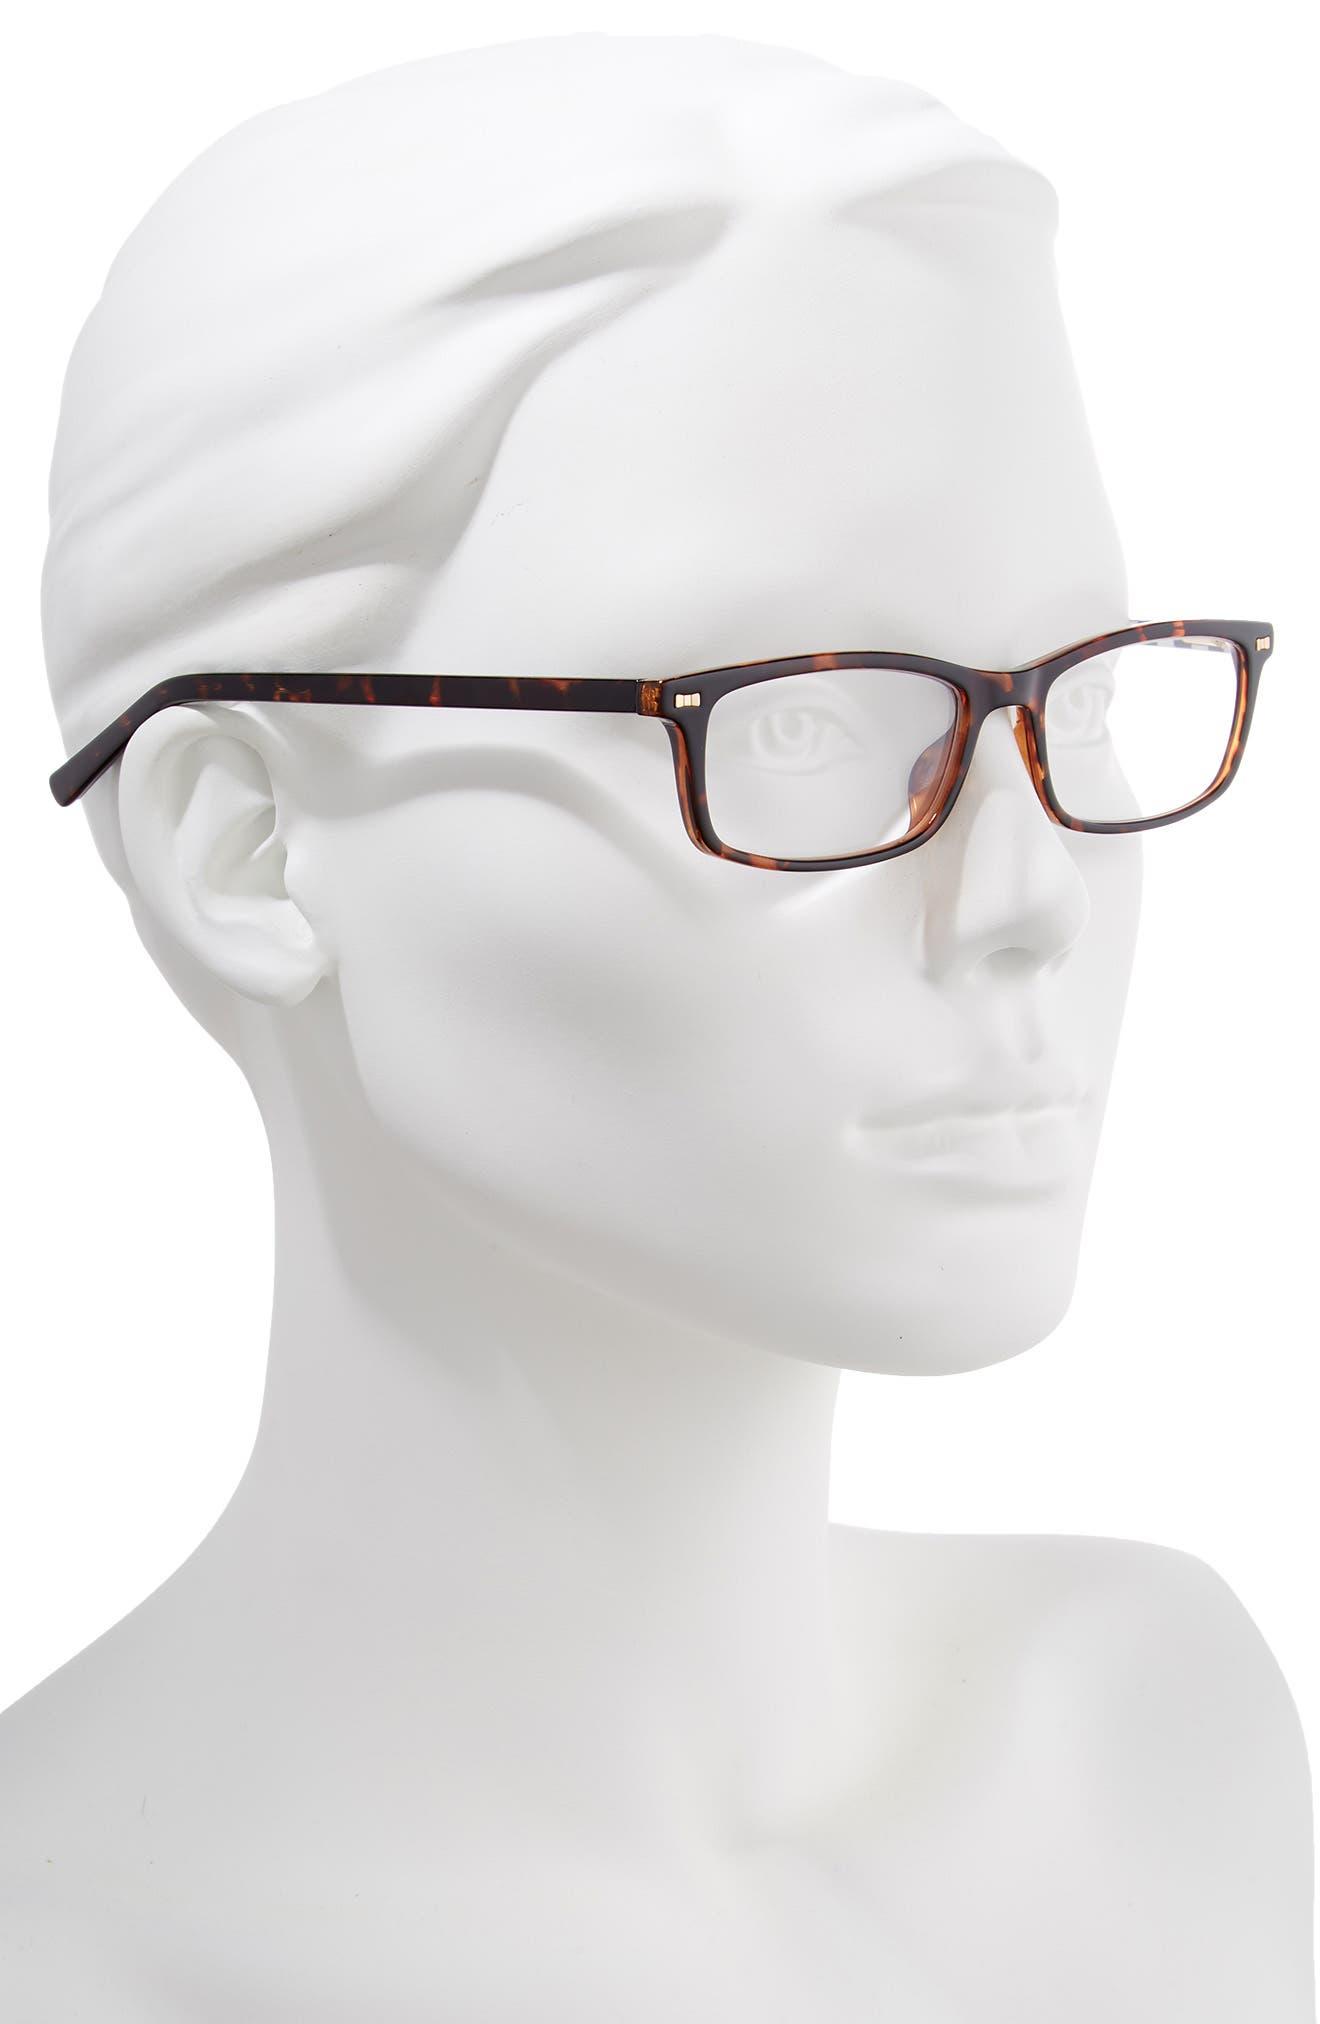 jodie 50mm rectangular reading glasses,                             Alternate thumbnail 2, color,                             HAVANA PATTERN